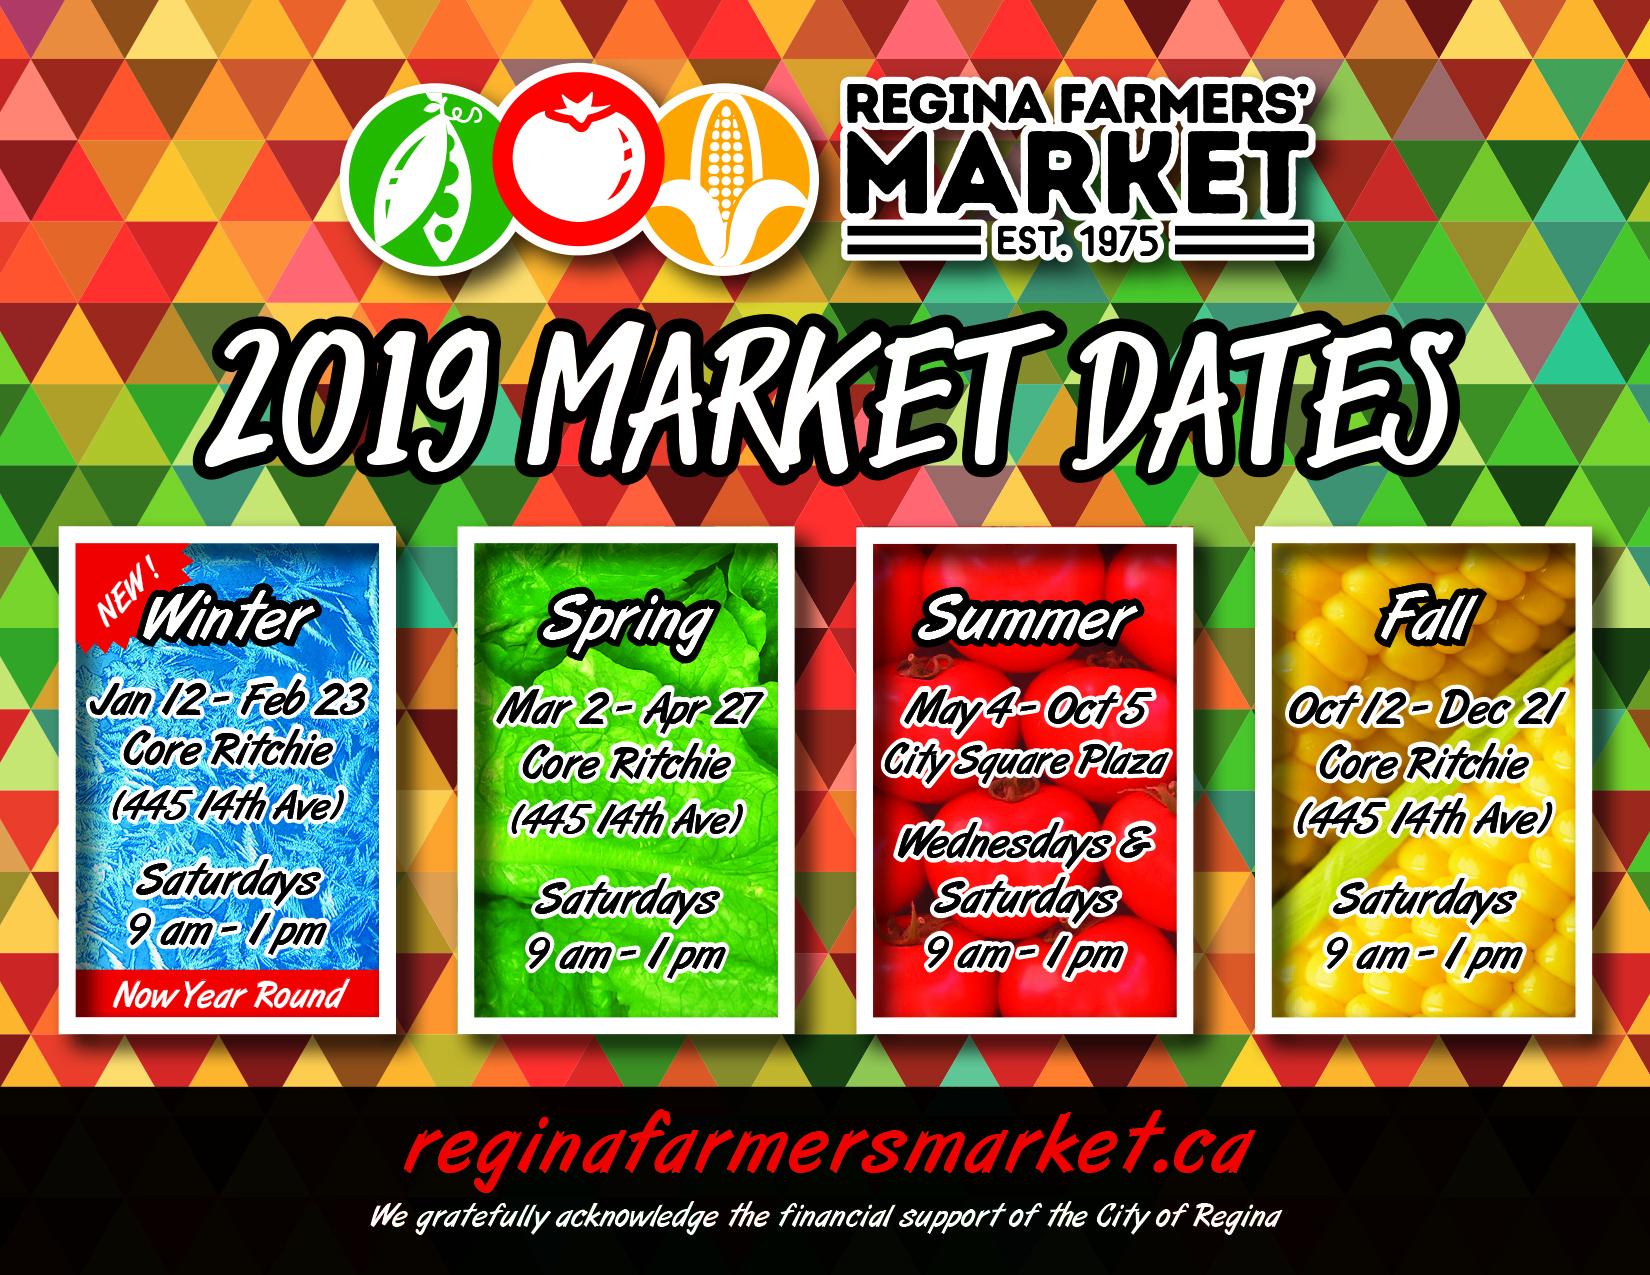 Holiday Farmers' Market - Image 3